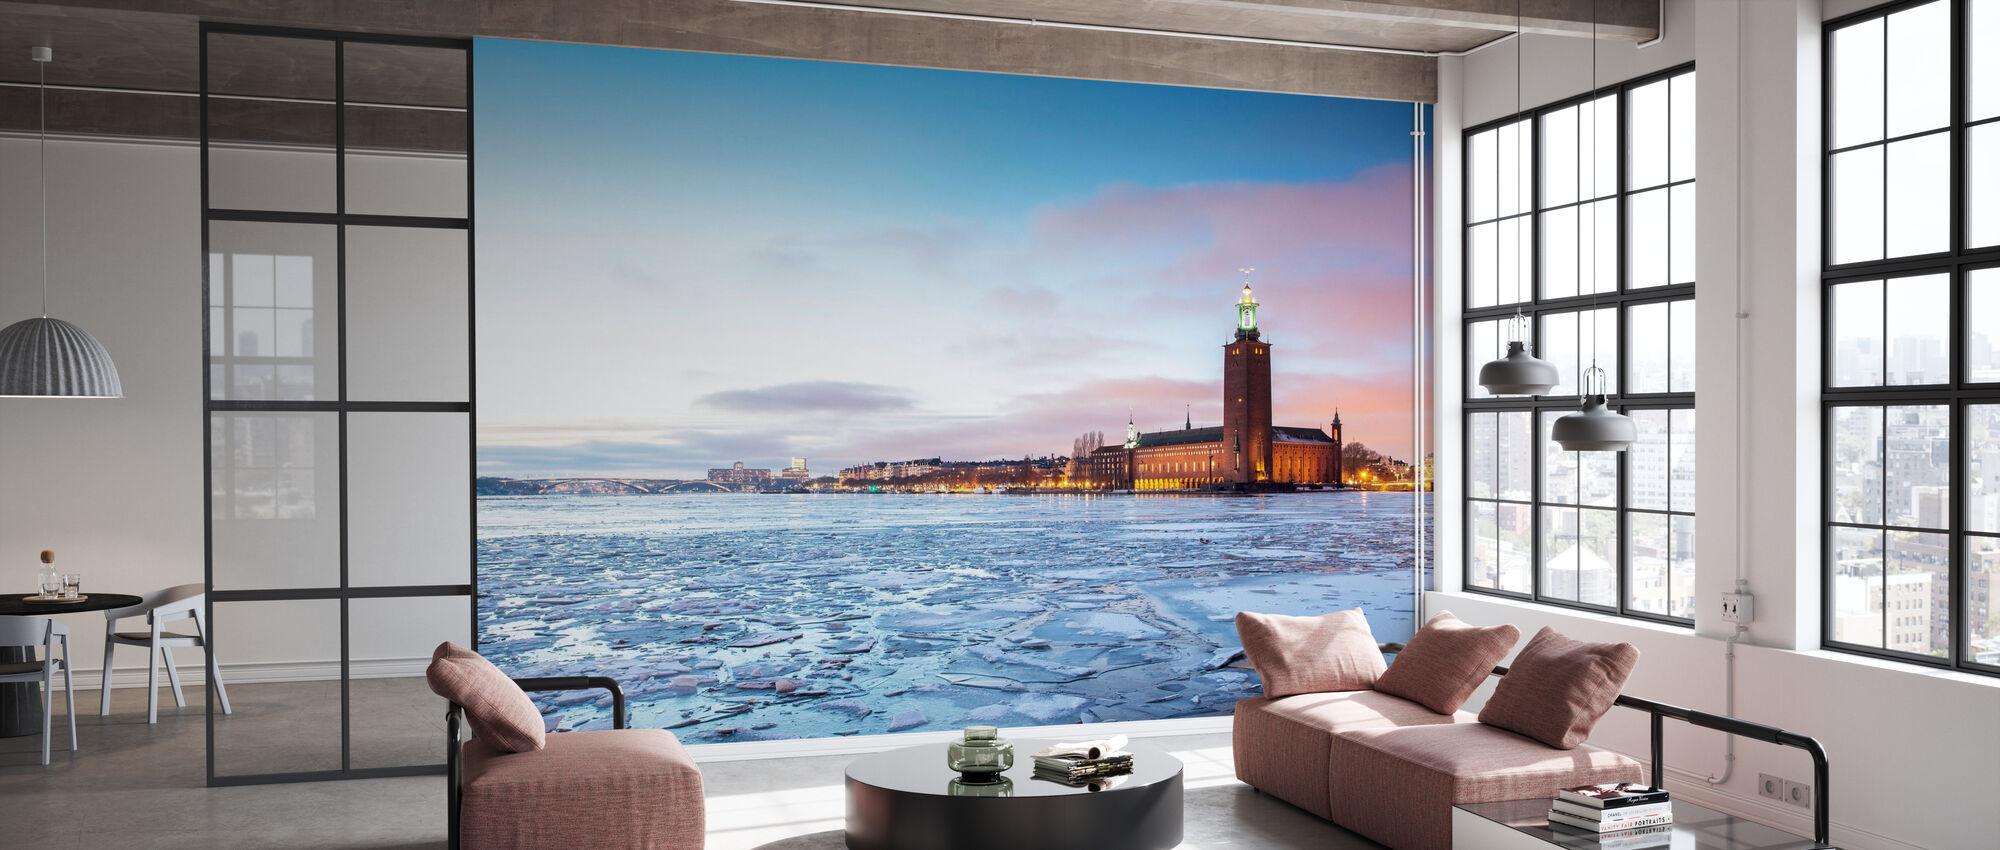 Stockholms stadshus på vintern - Tapet - Kontor